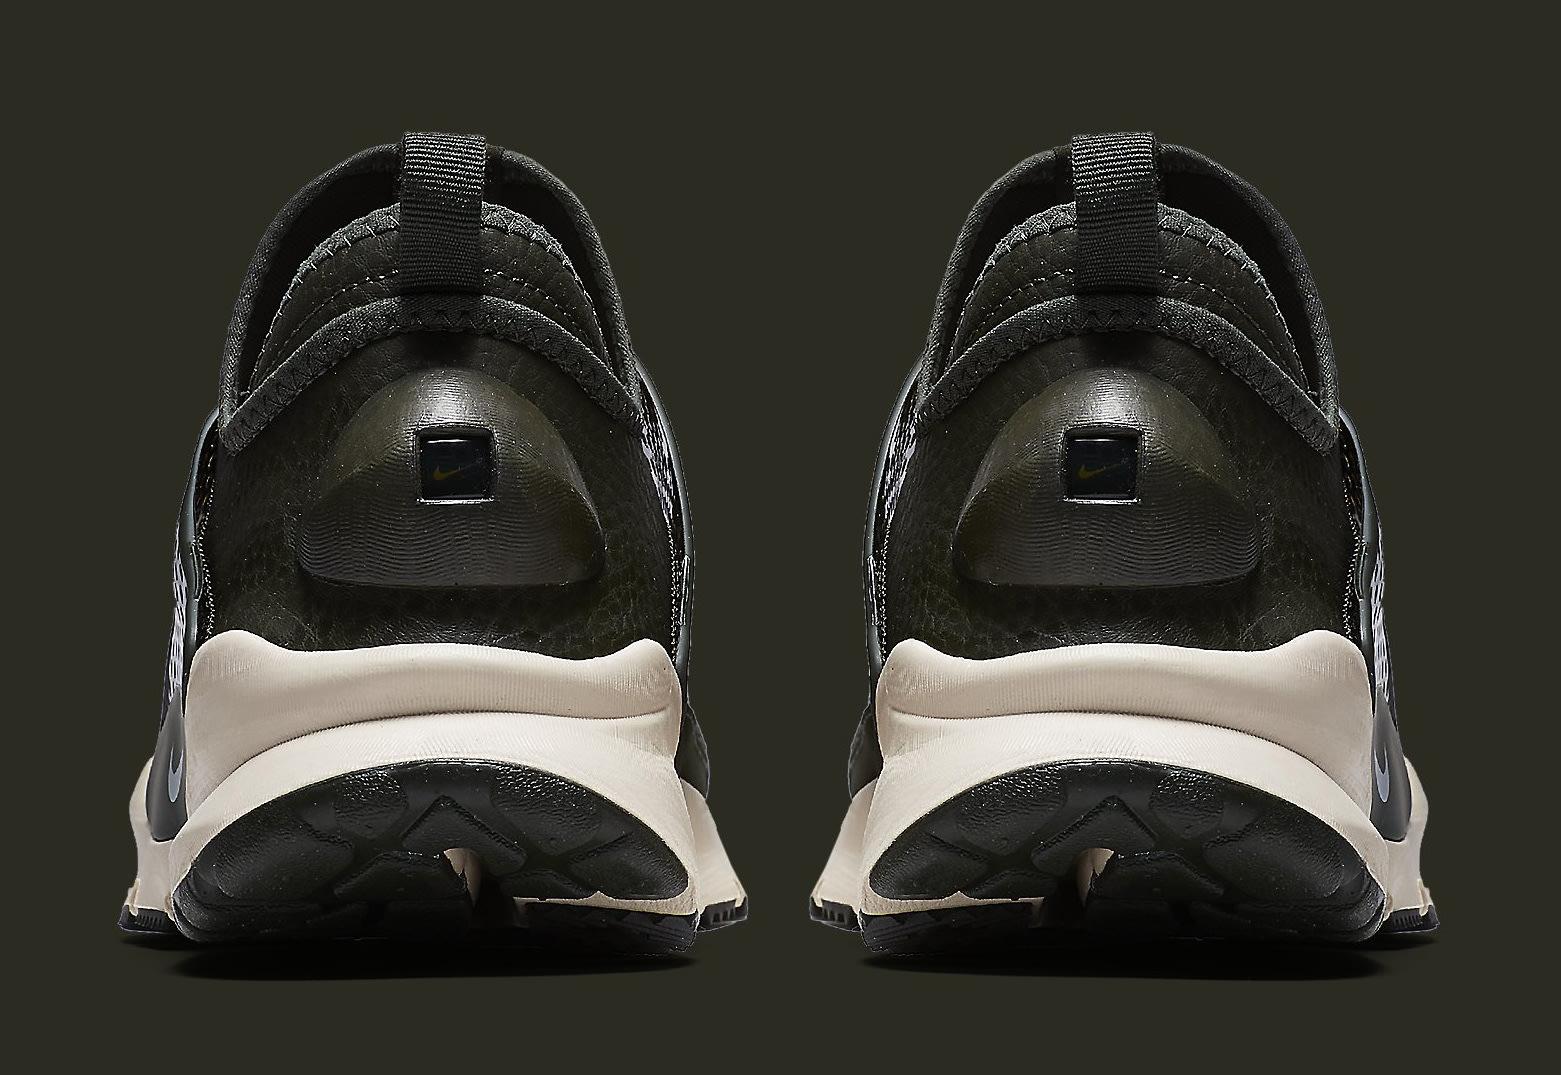 Stone Island Nike Sock Dart 910090-300 Heel